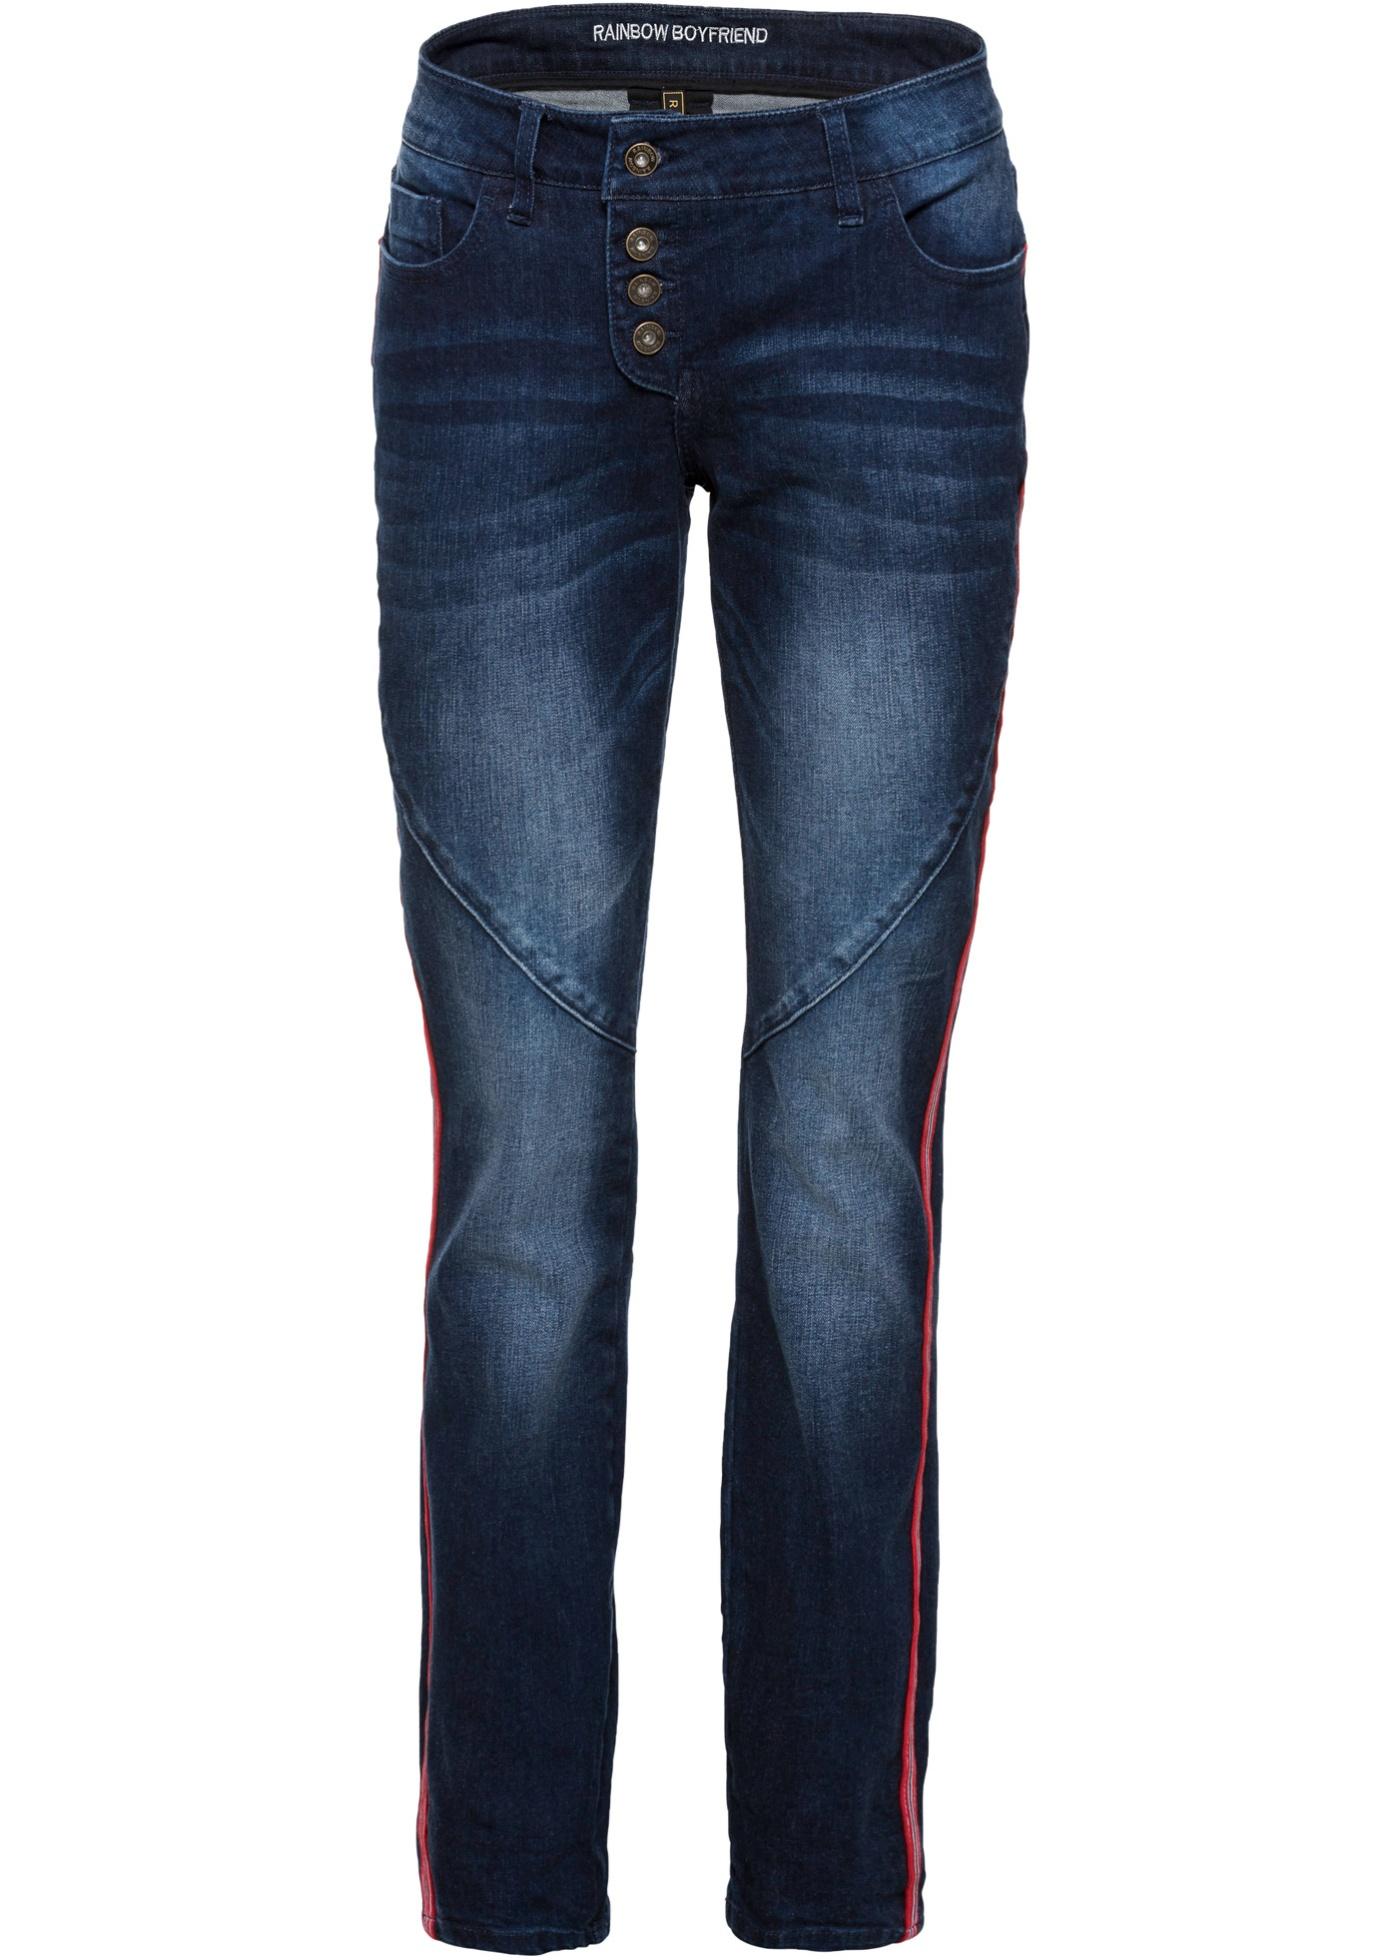 Hosen - Boyfriend Jeans › bonprix › schwarz  - Onlineshop Bonprix